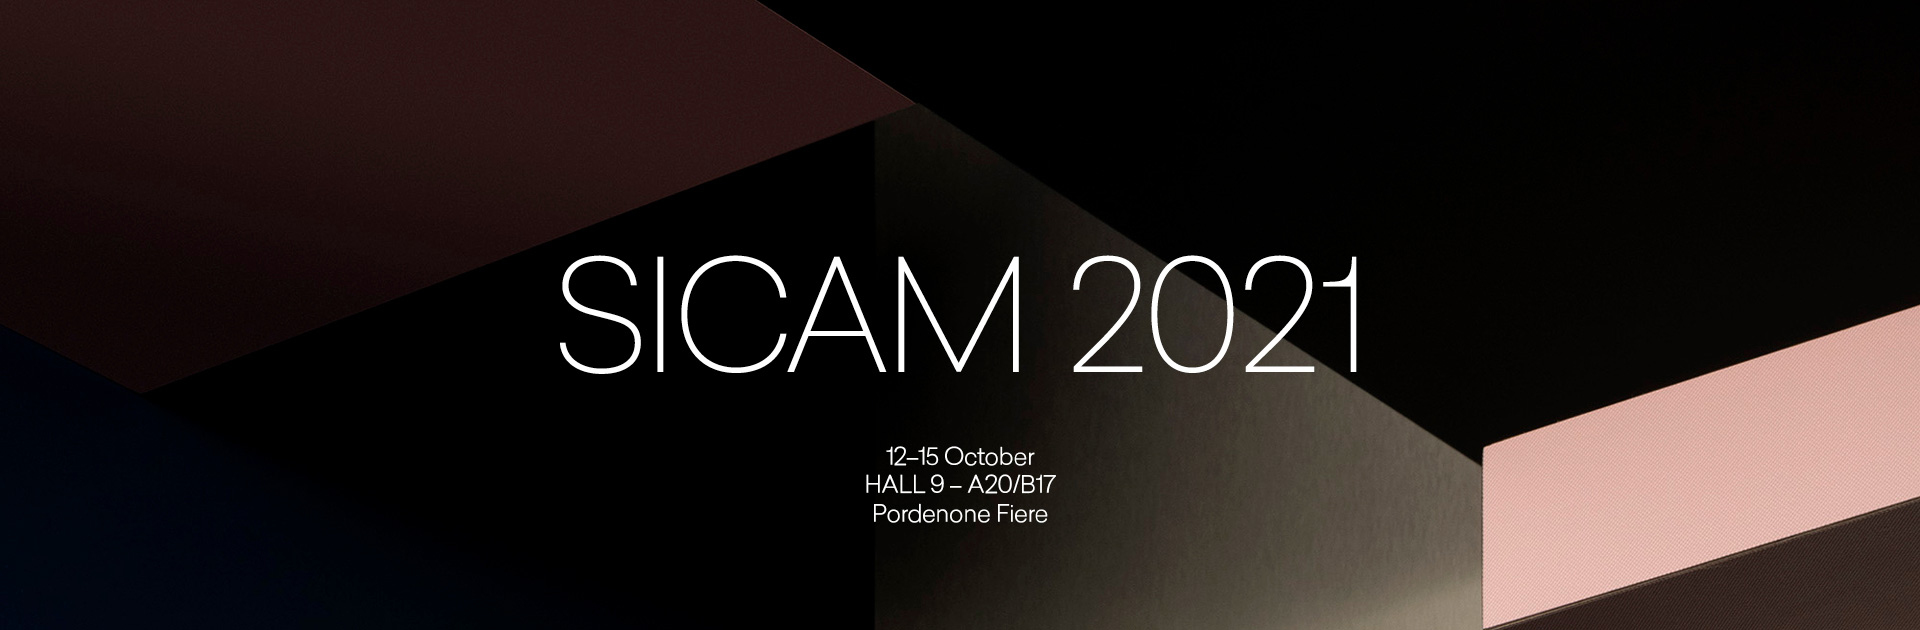 Arpa, FENIX®, Getacore® and Homapal® together at SICAM 2021 -